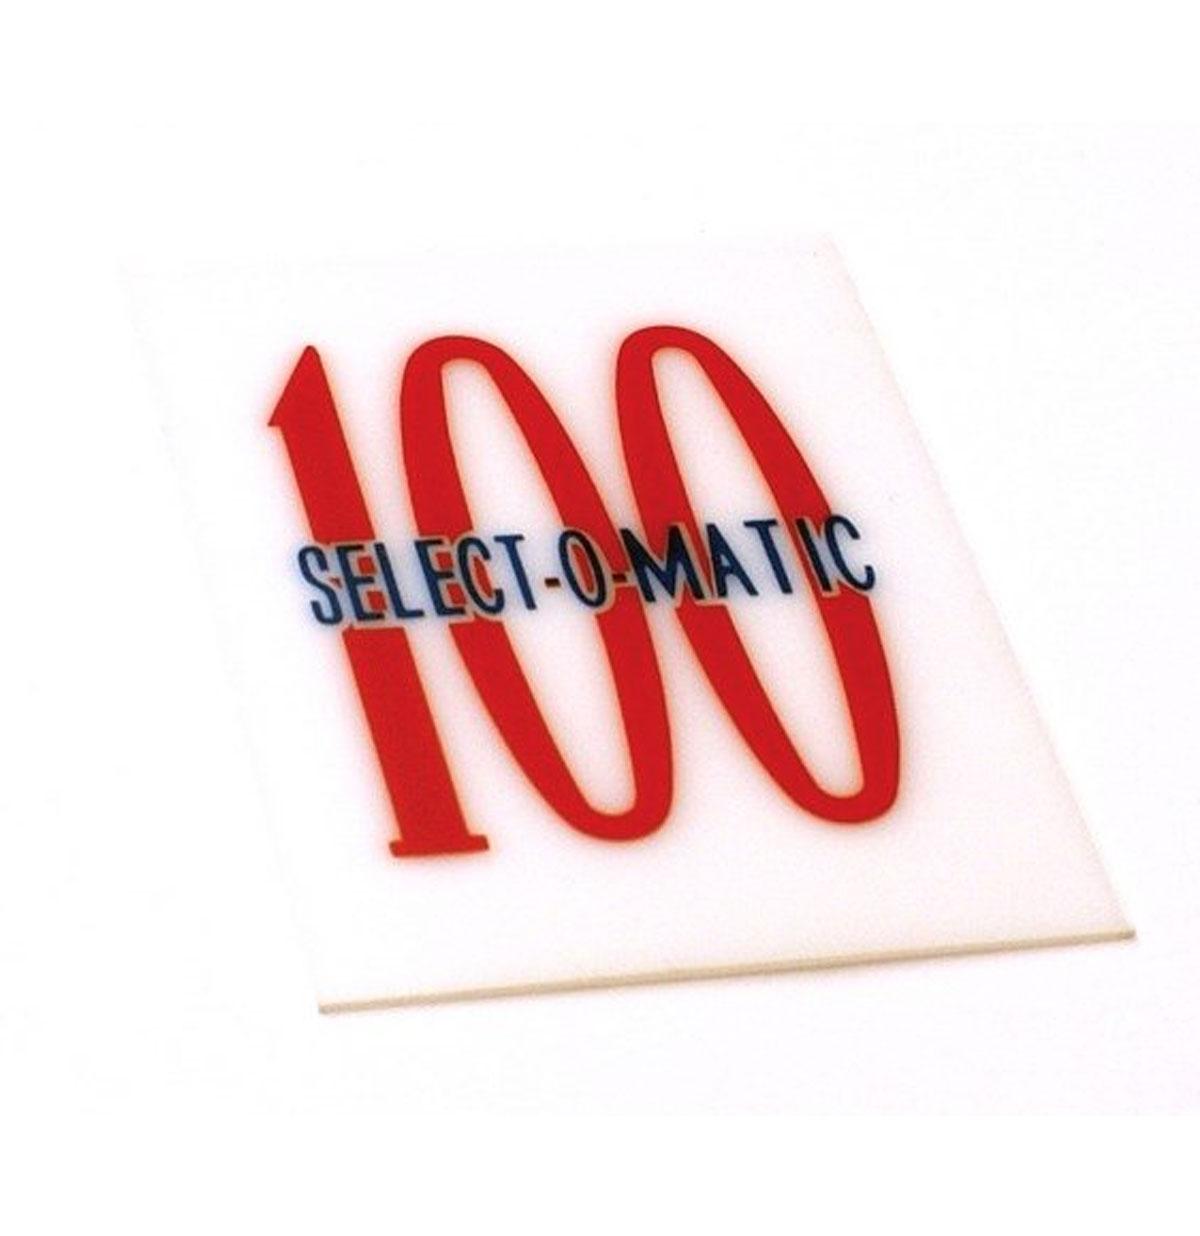 Seeburg 100 G/W kaartje mechaniek kap 100 Select-O-Matic